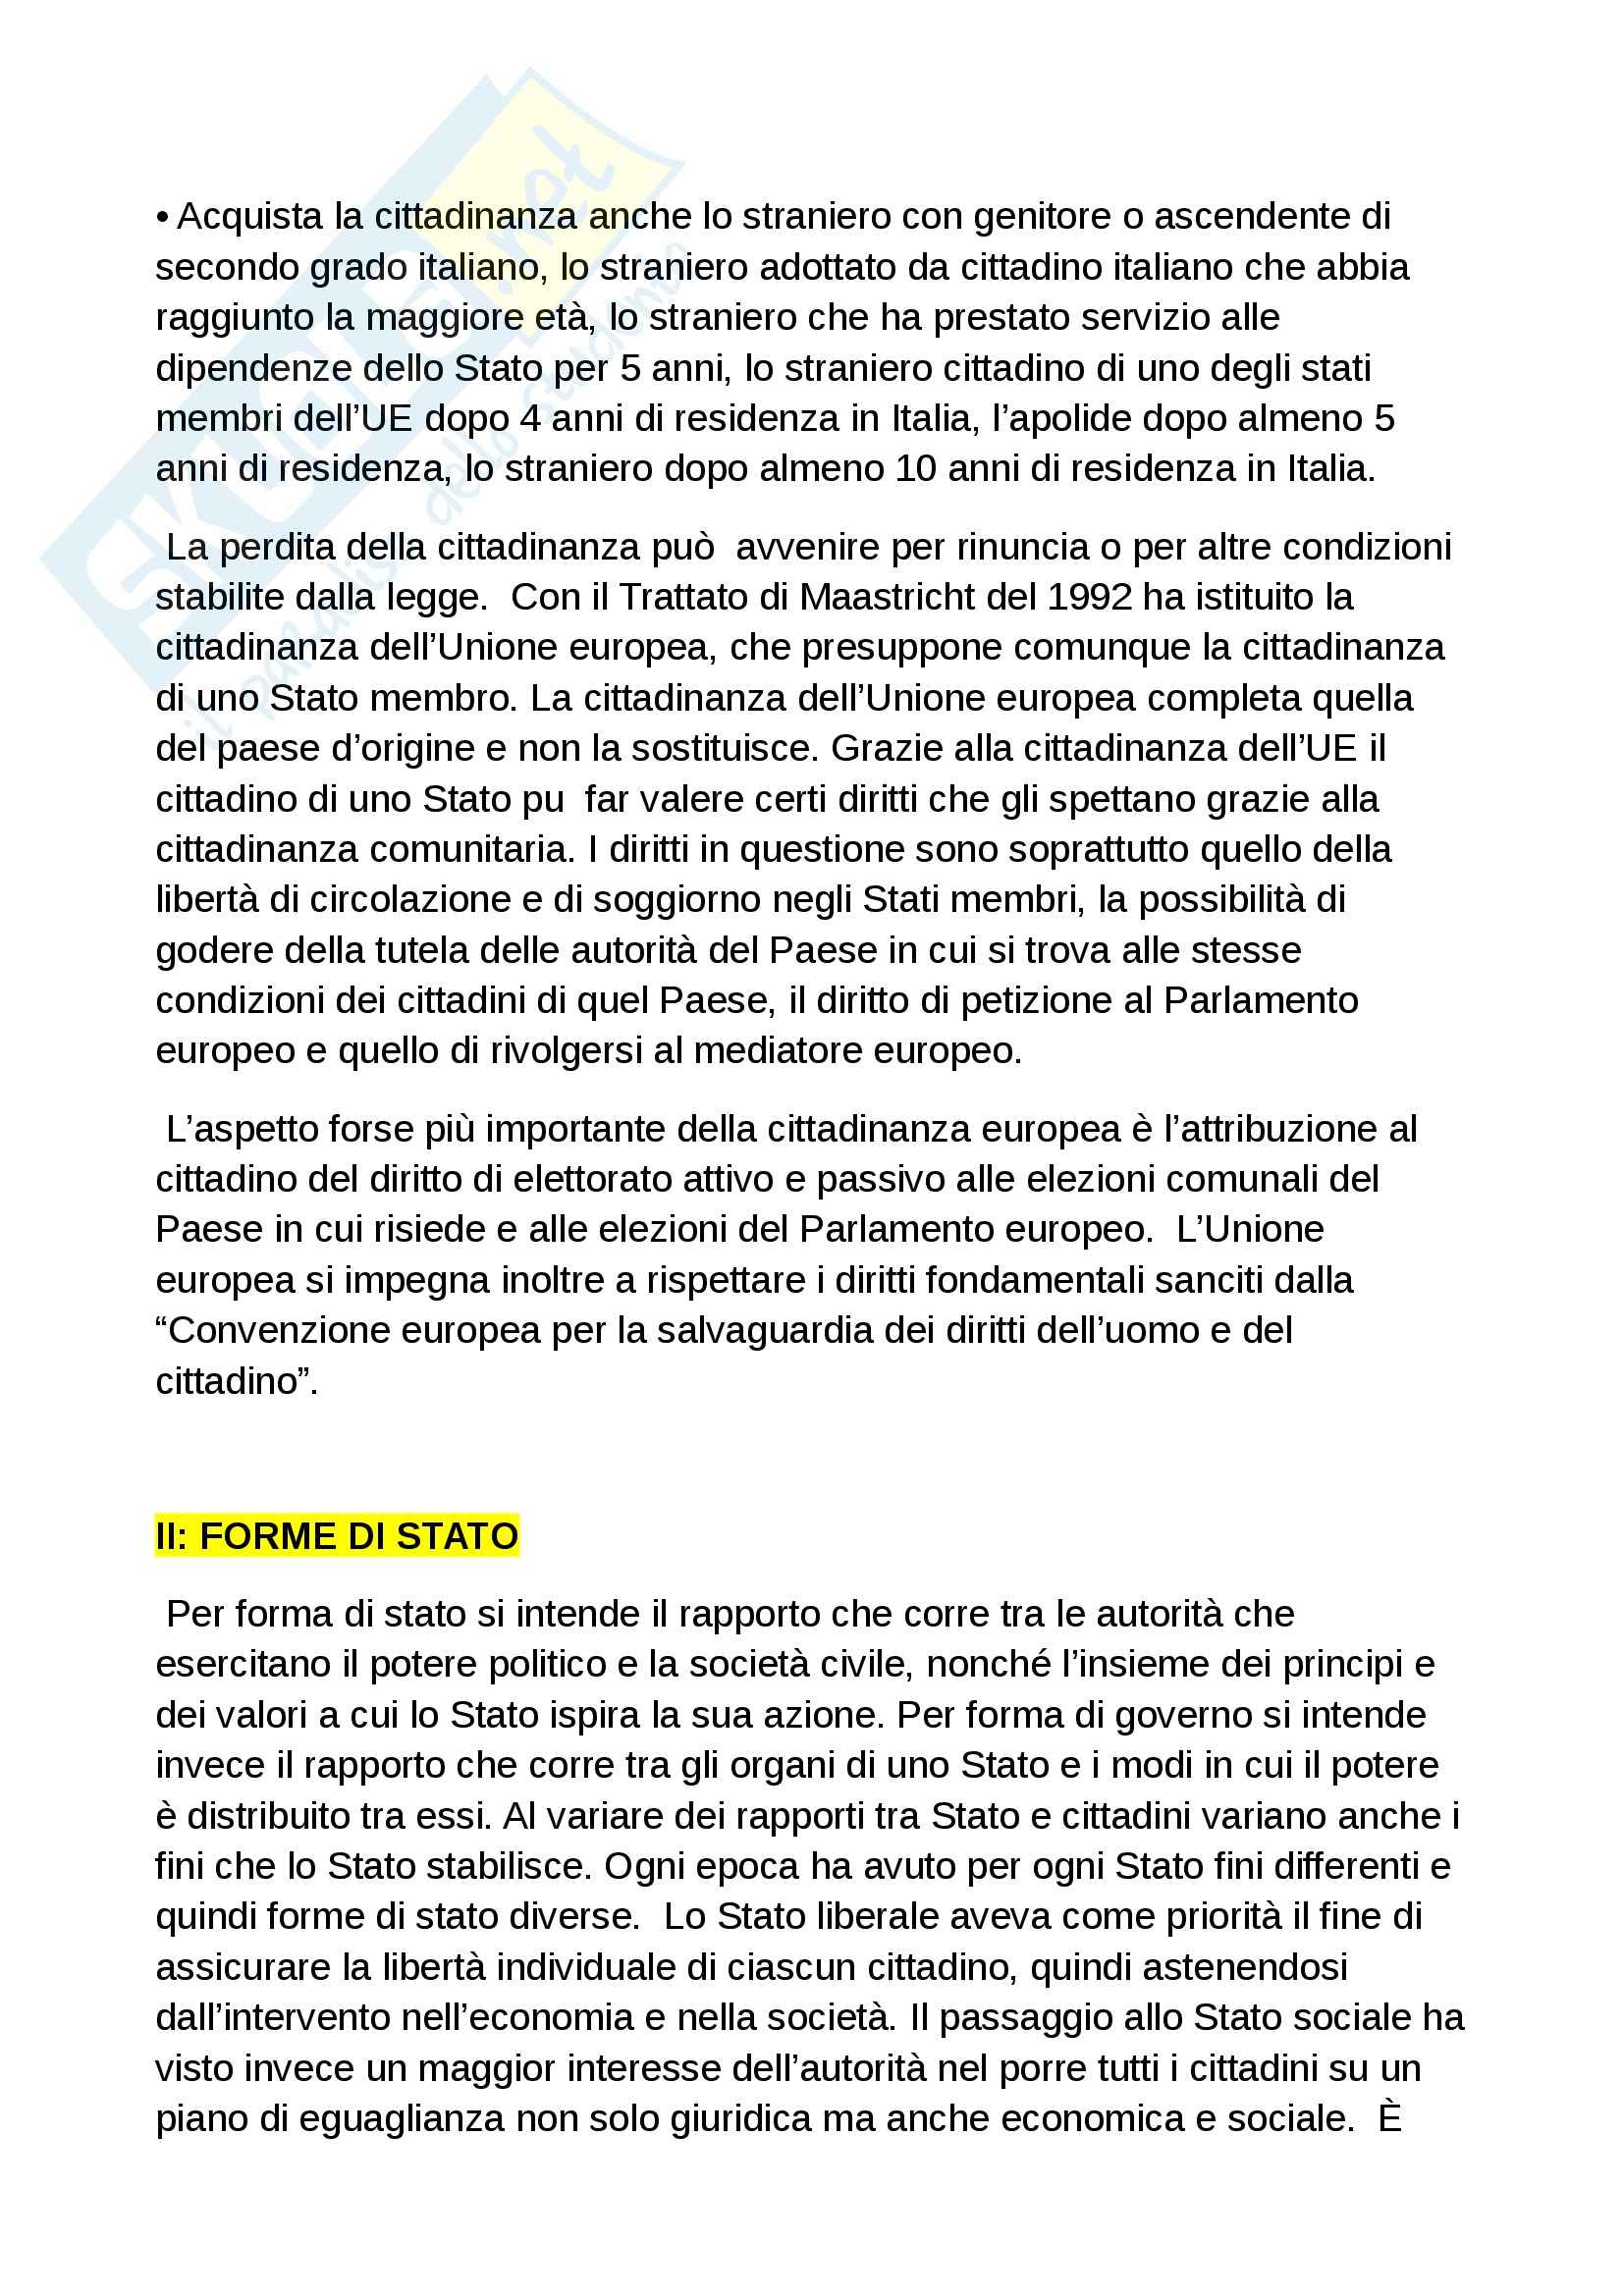 Riassunto esame diritto costituzionale, prof. Grosso, libro Diritto costituzionale, Bin, Pitruzzella Pag. 6